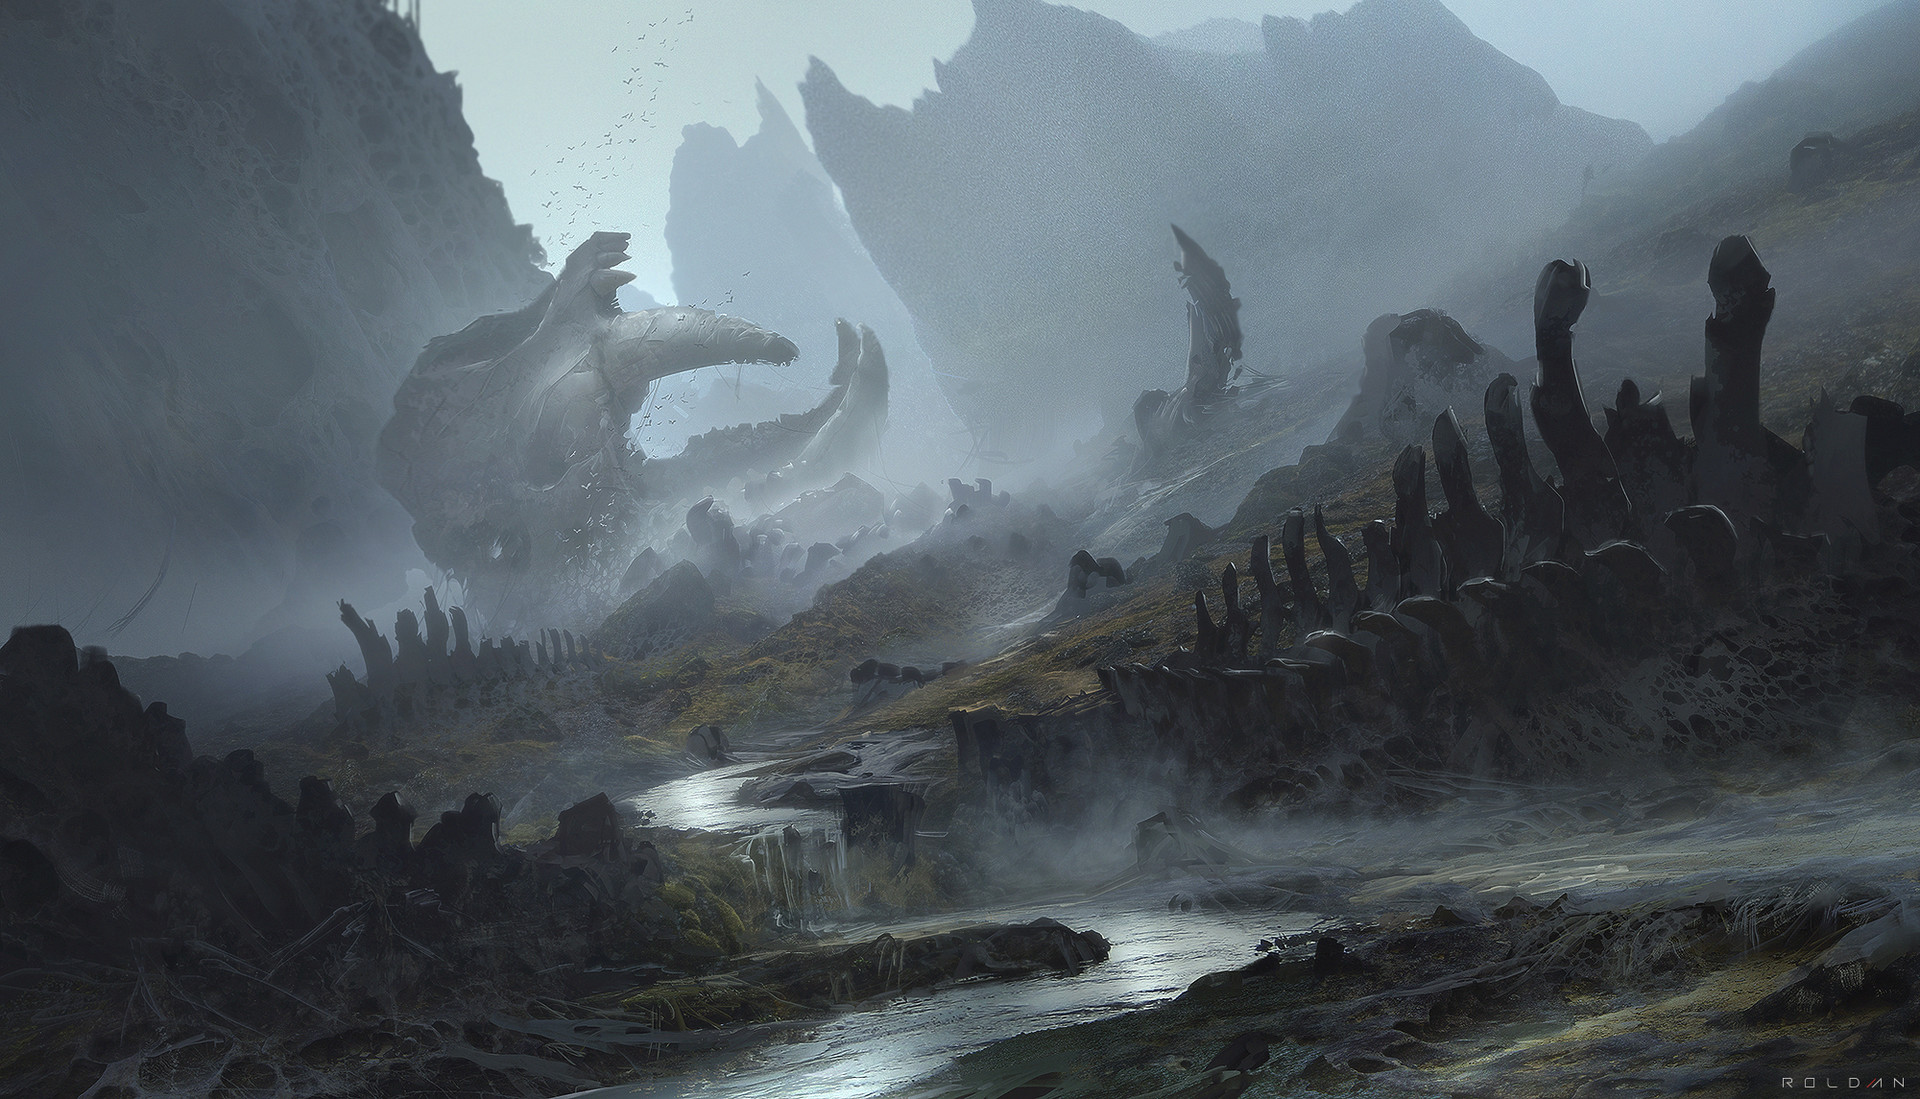 Artstation death valley juan pablo roldan - Fantasy desktop pictures ...